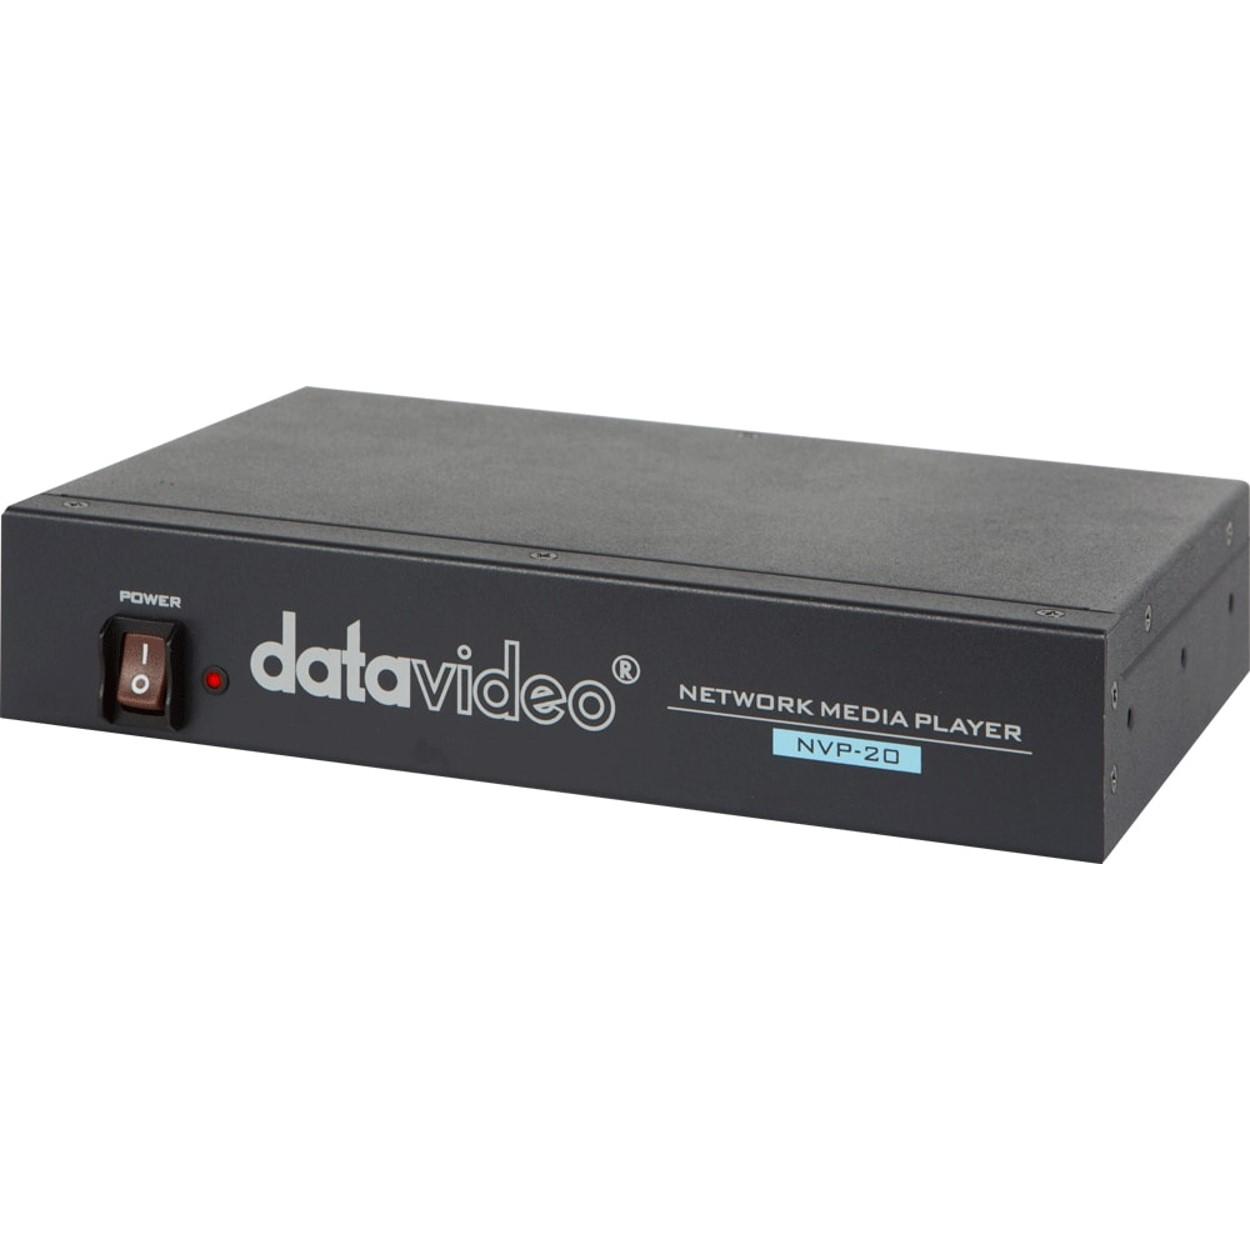 Datavideo NVP-20